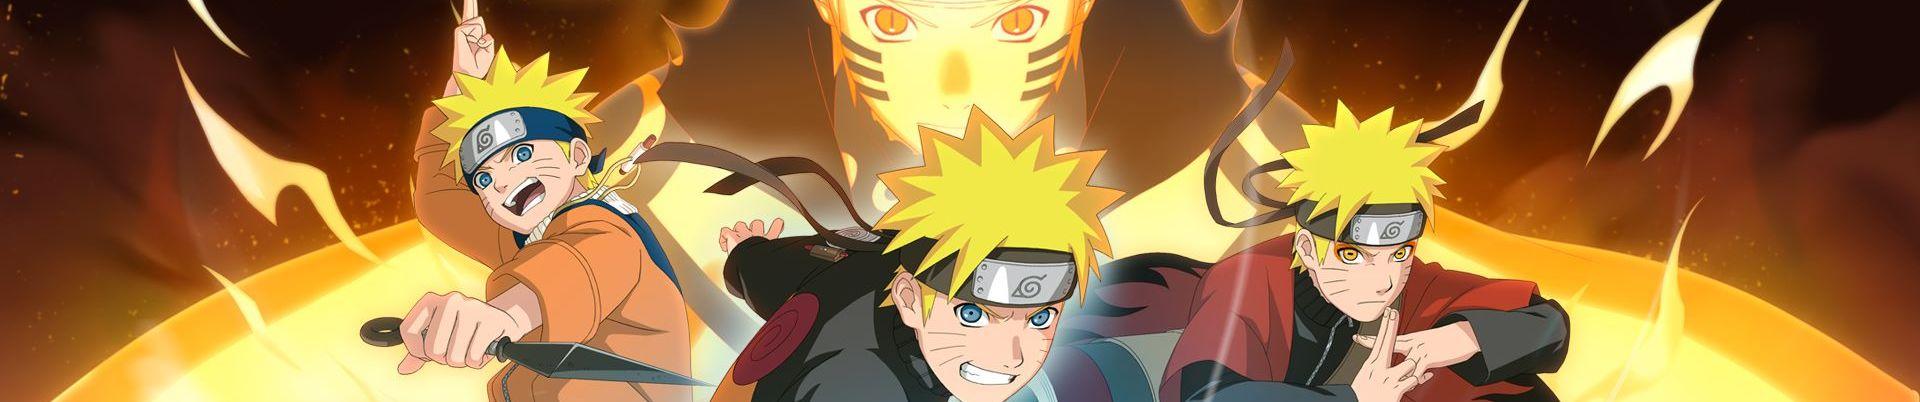 Naruto kid | Free Listening on SoundCloud